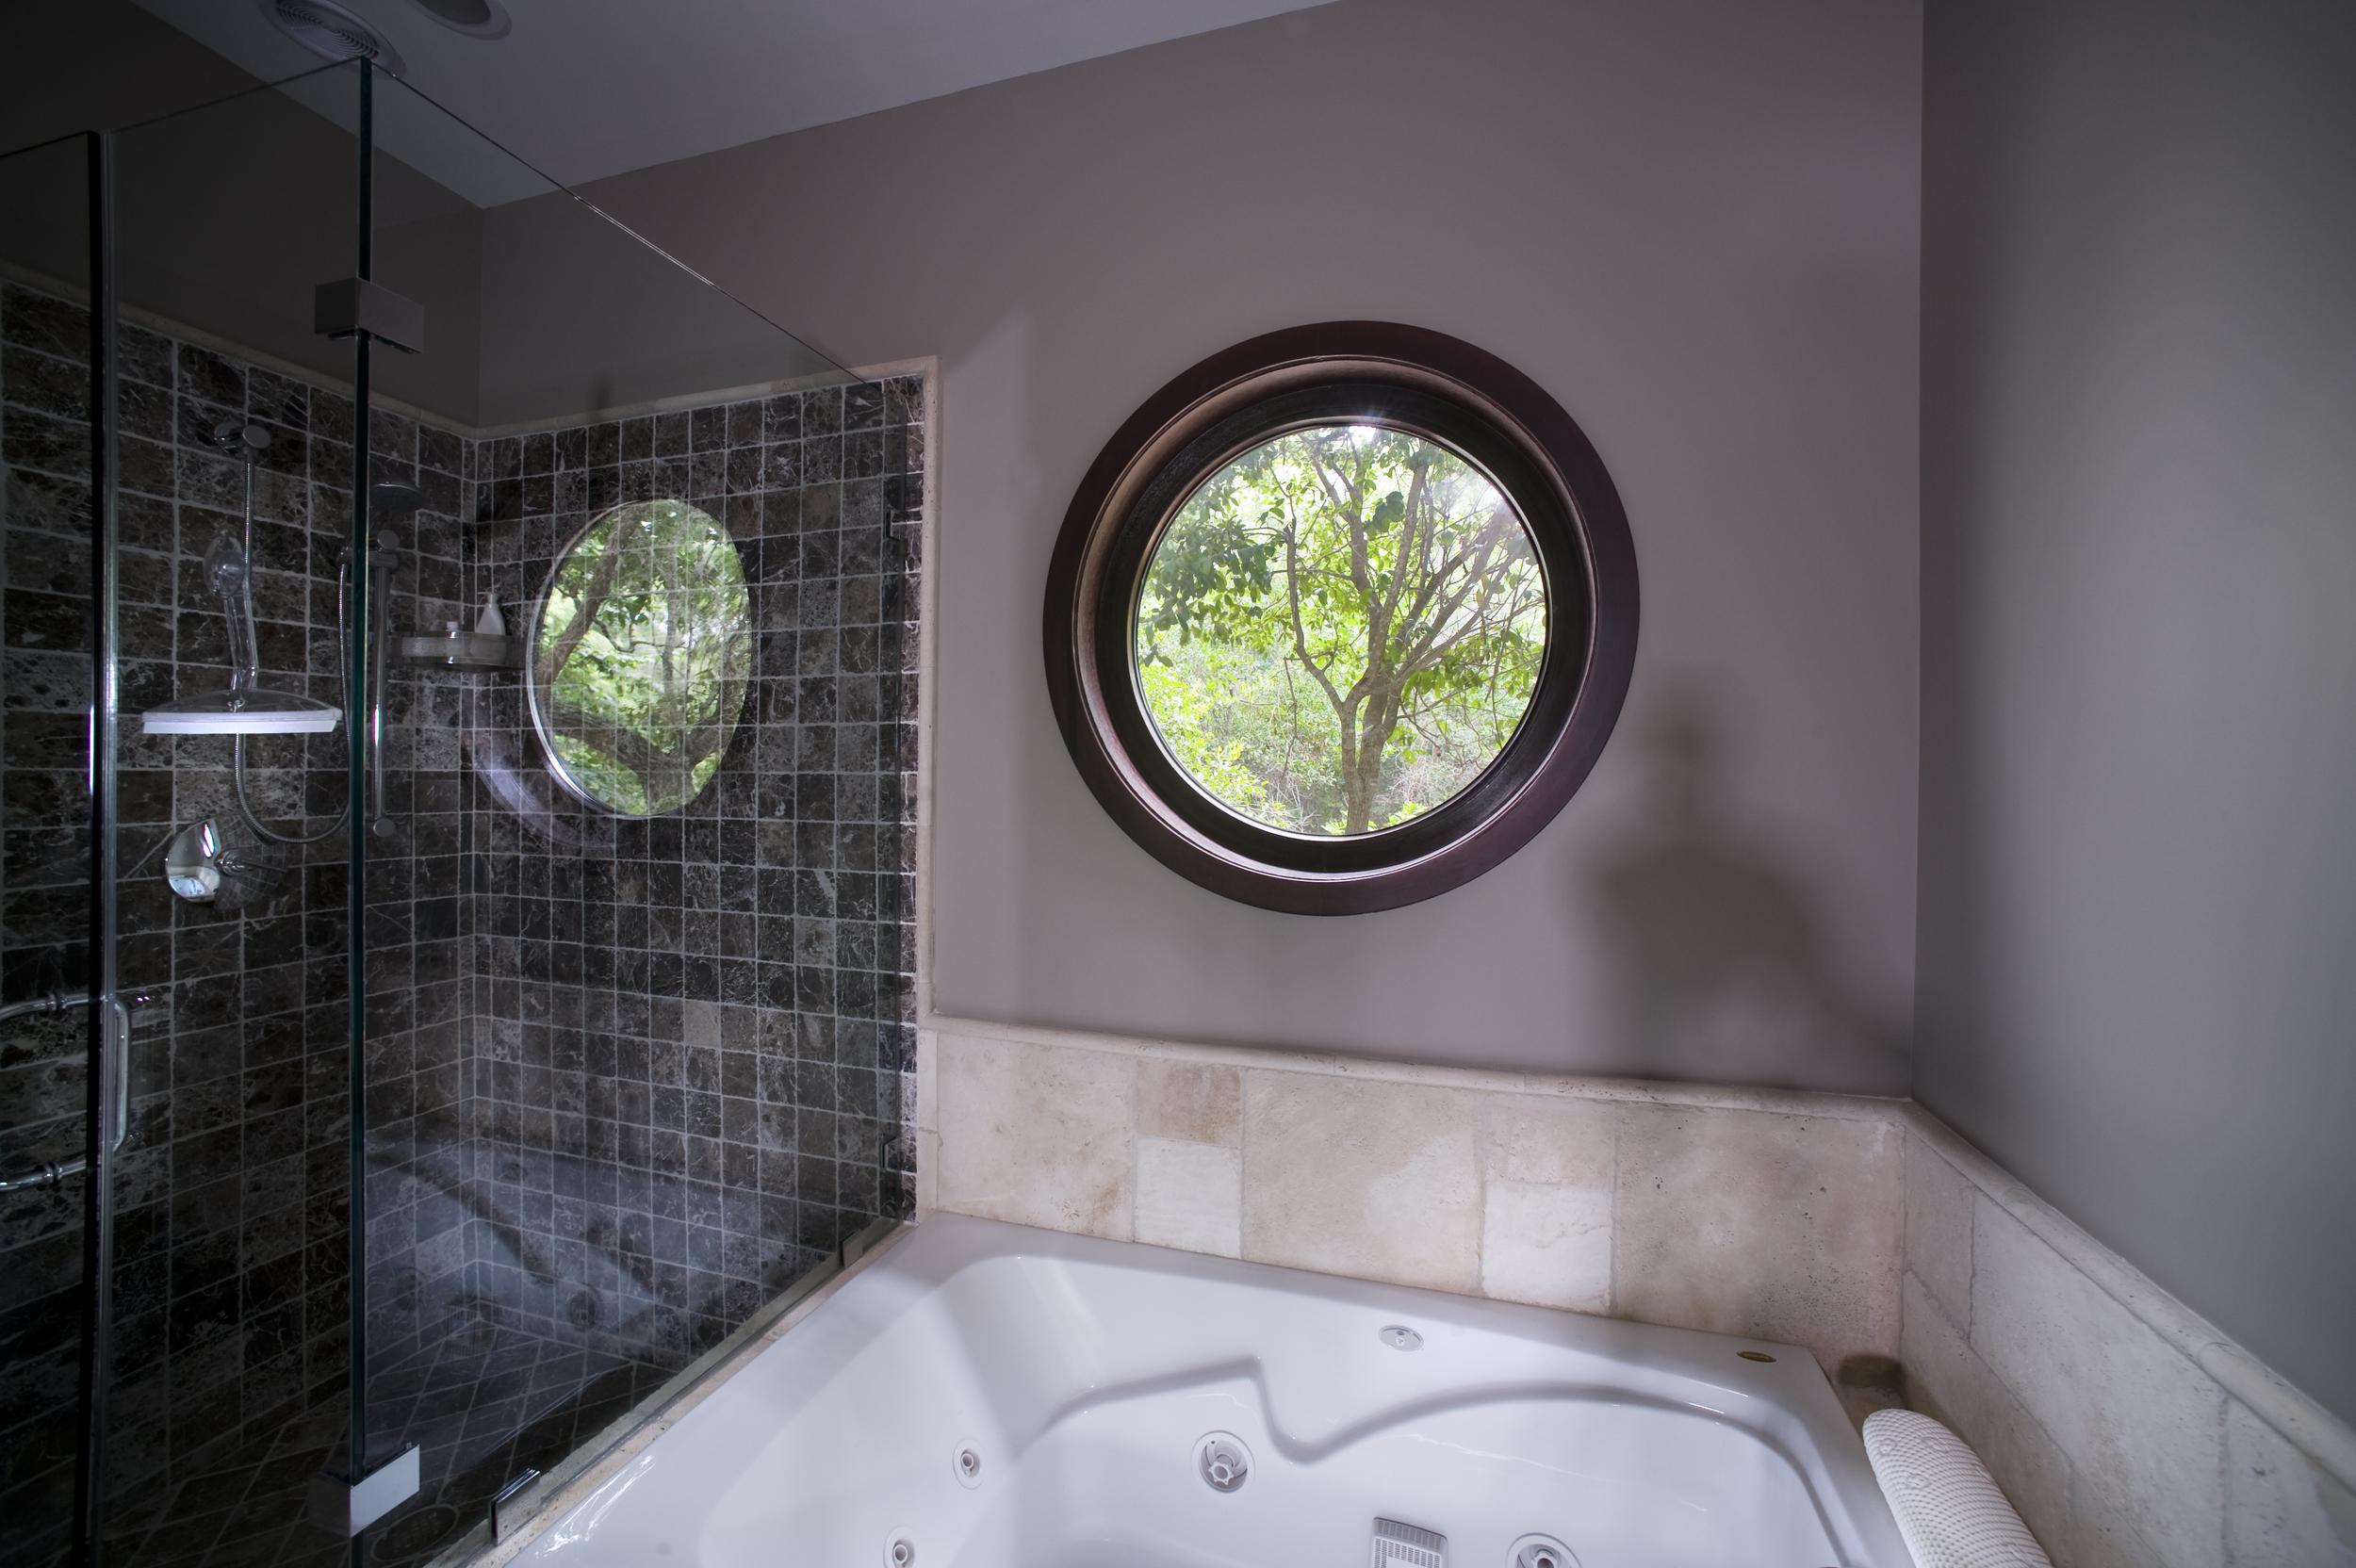 Circular Windows